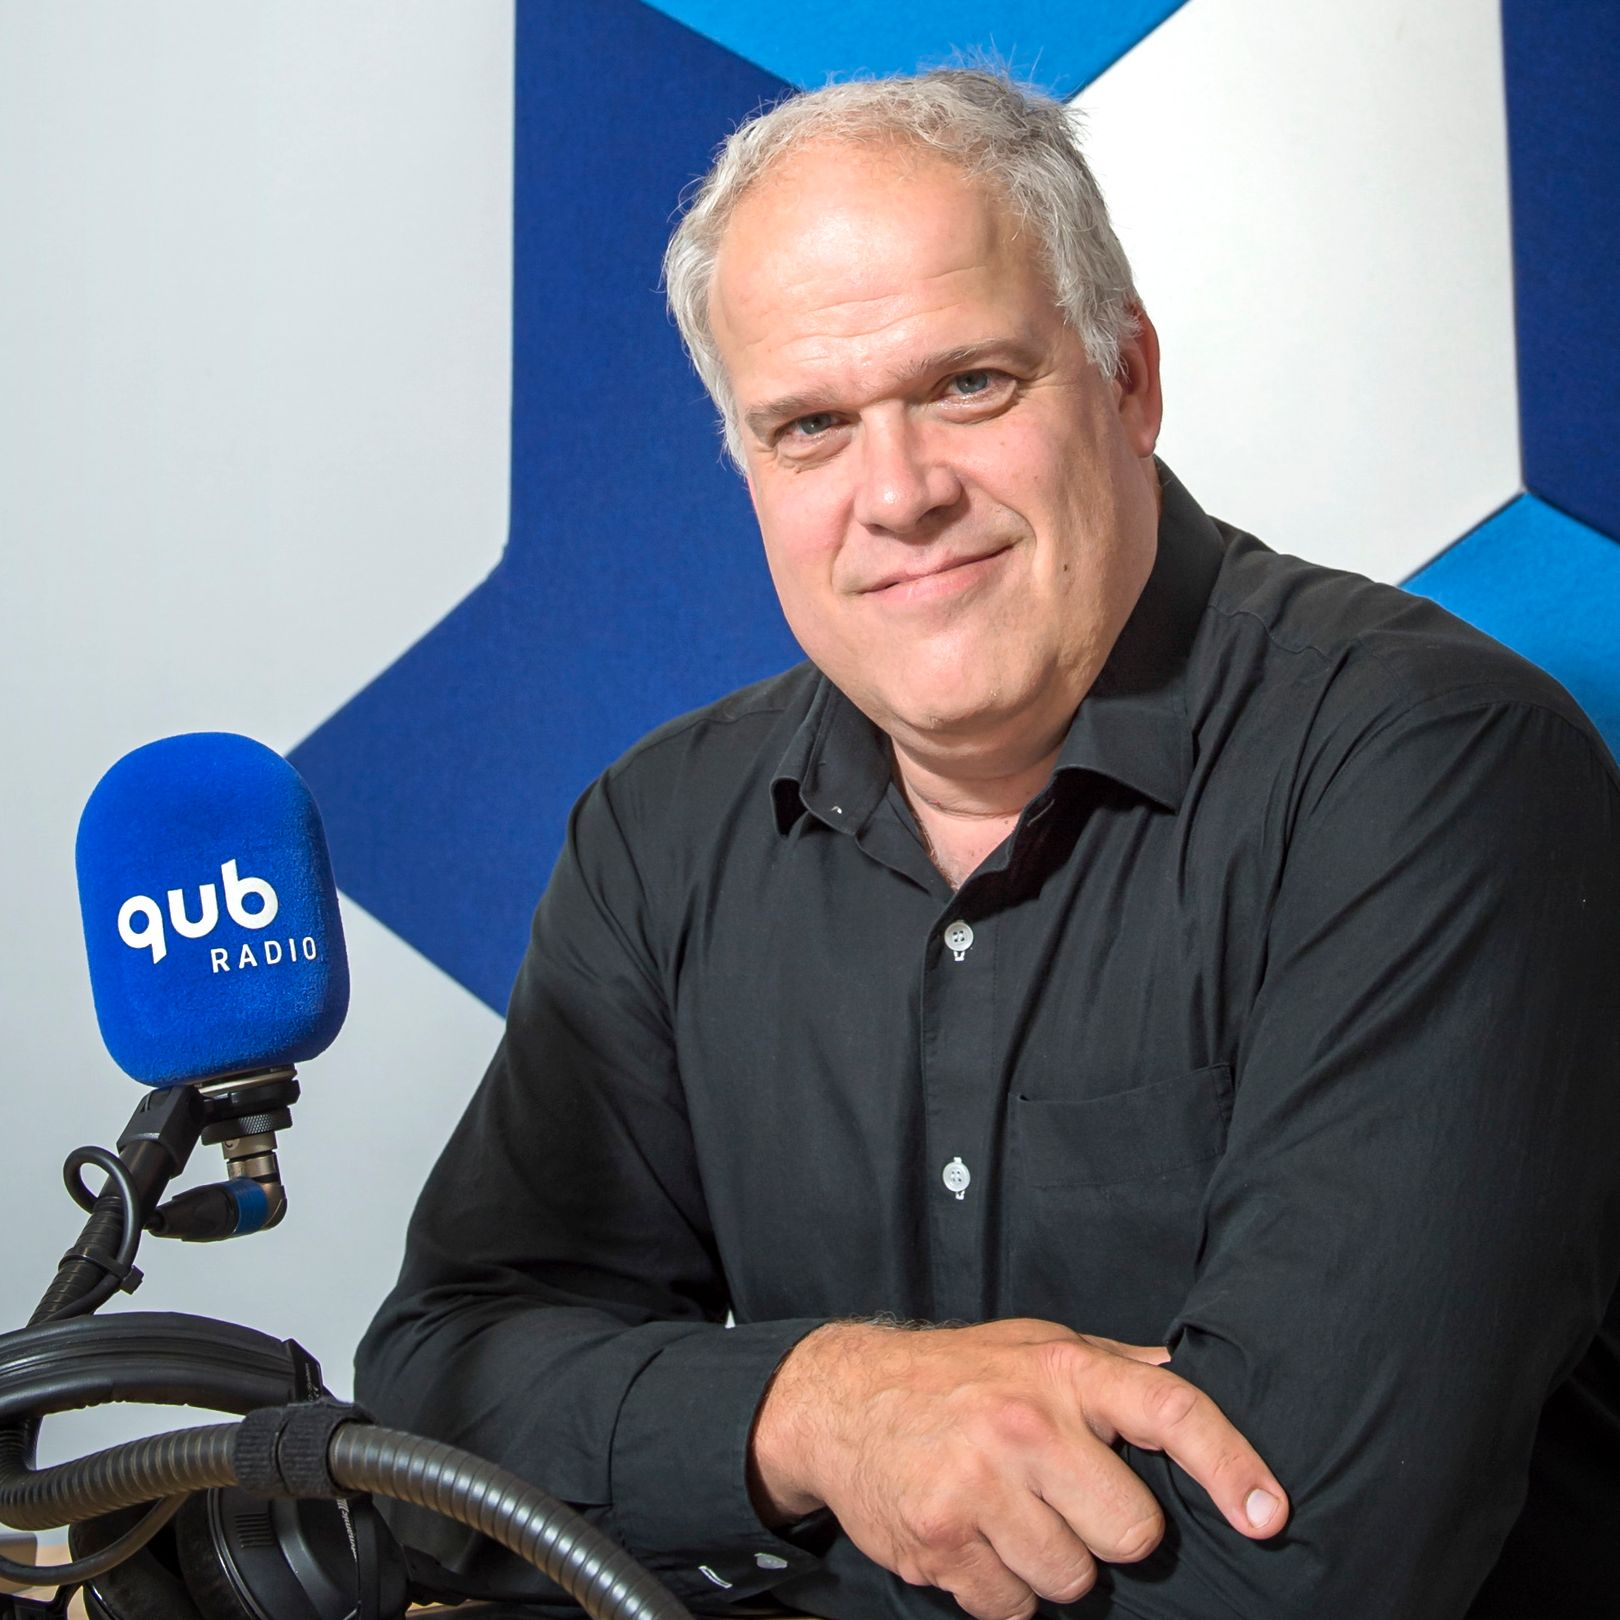 An I'view w/ Mathieu Turbide, VP of Digital Content, Quebecor on QUB Radio